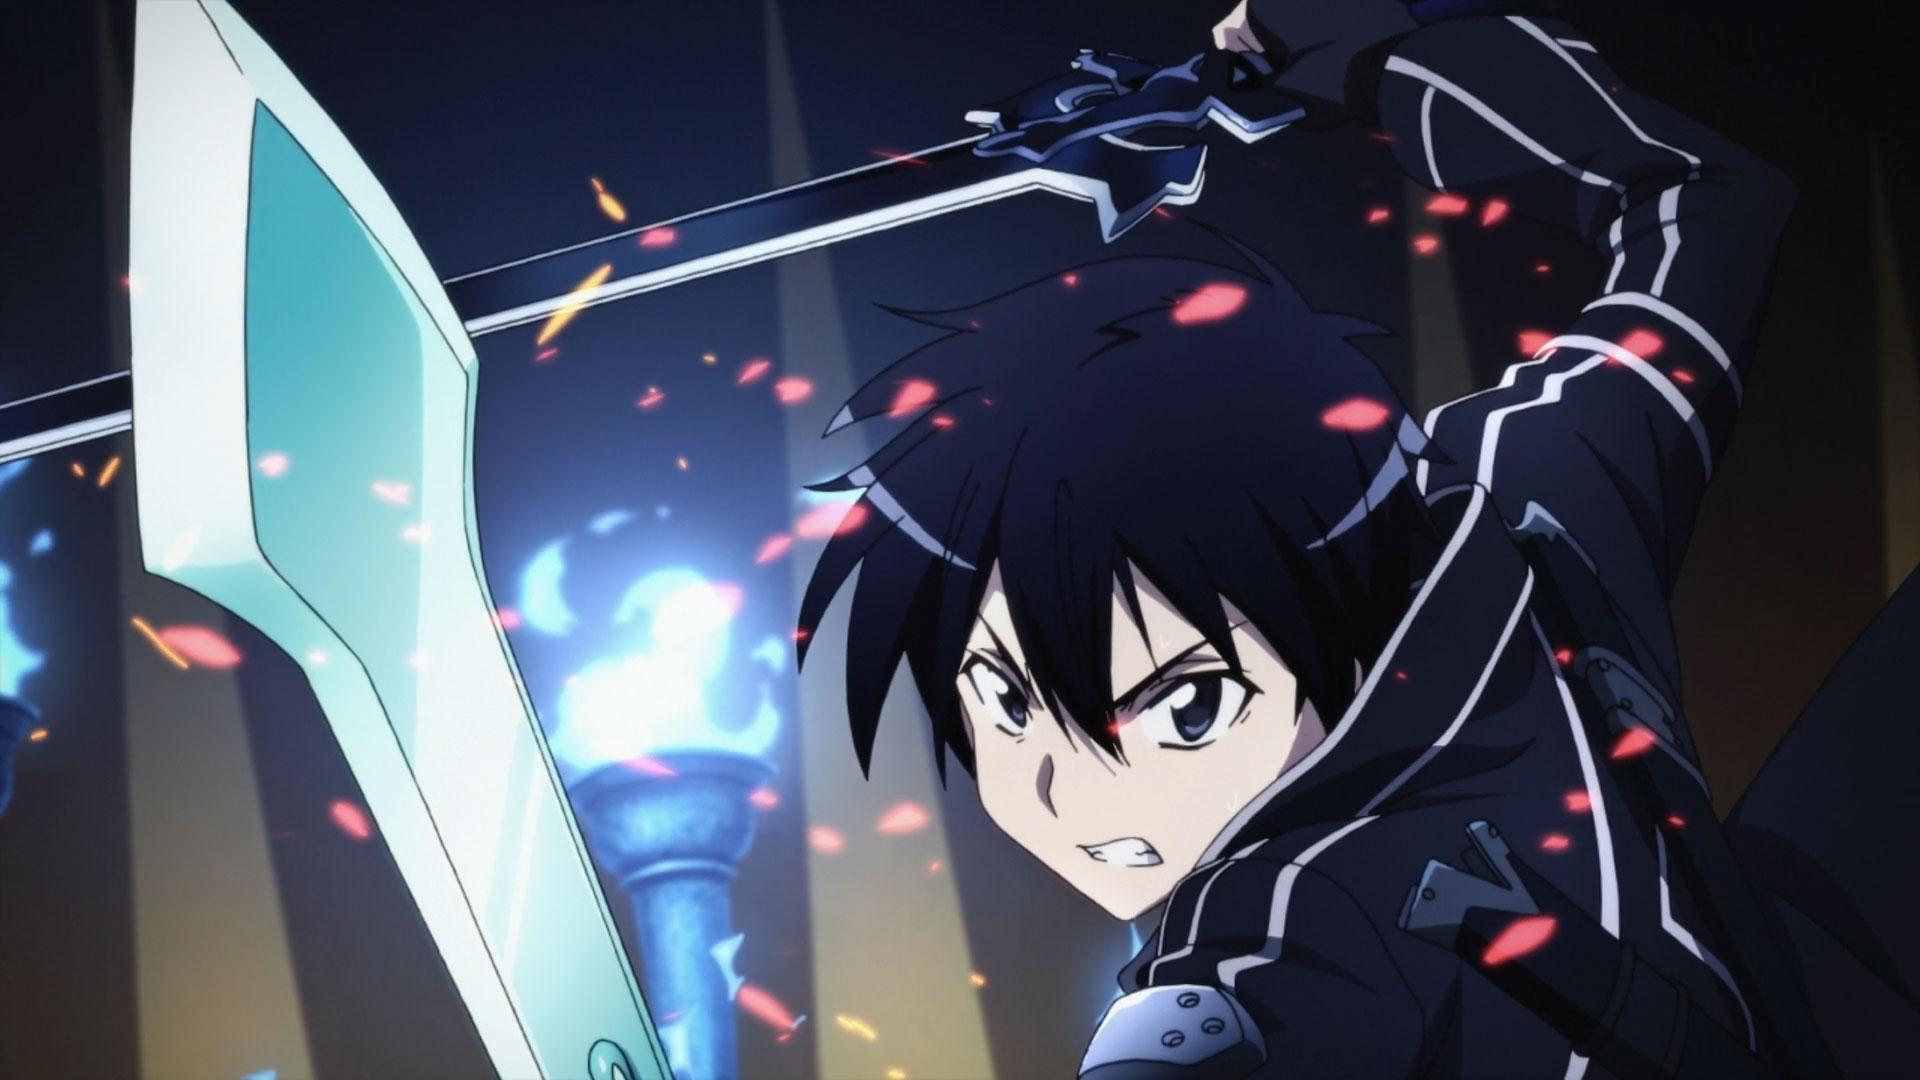 sword art online videogioco